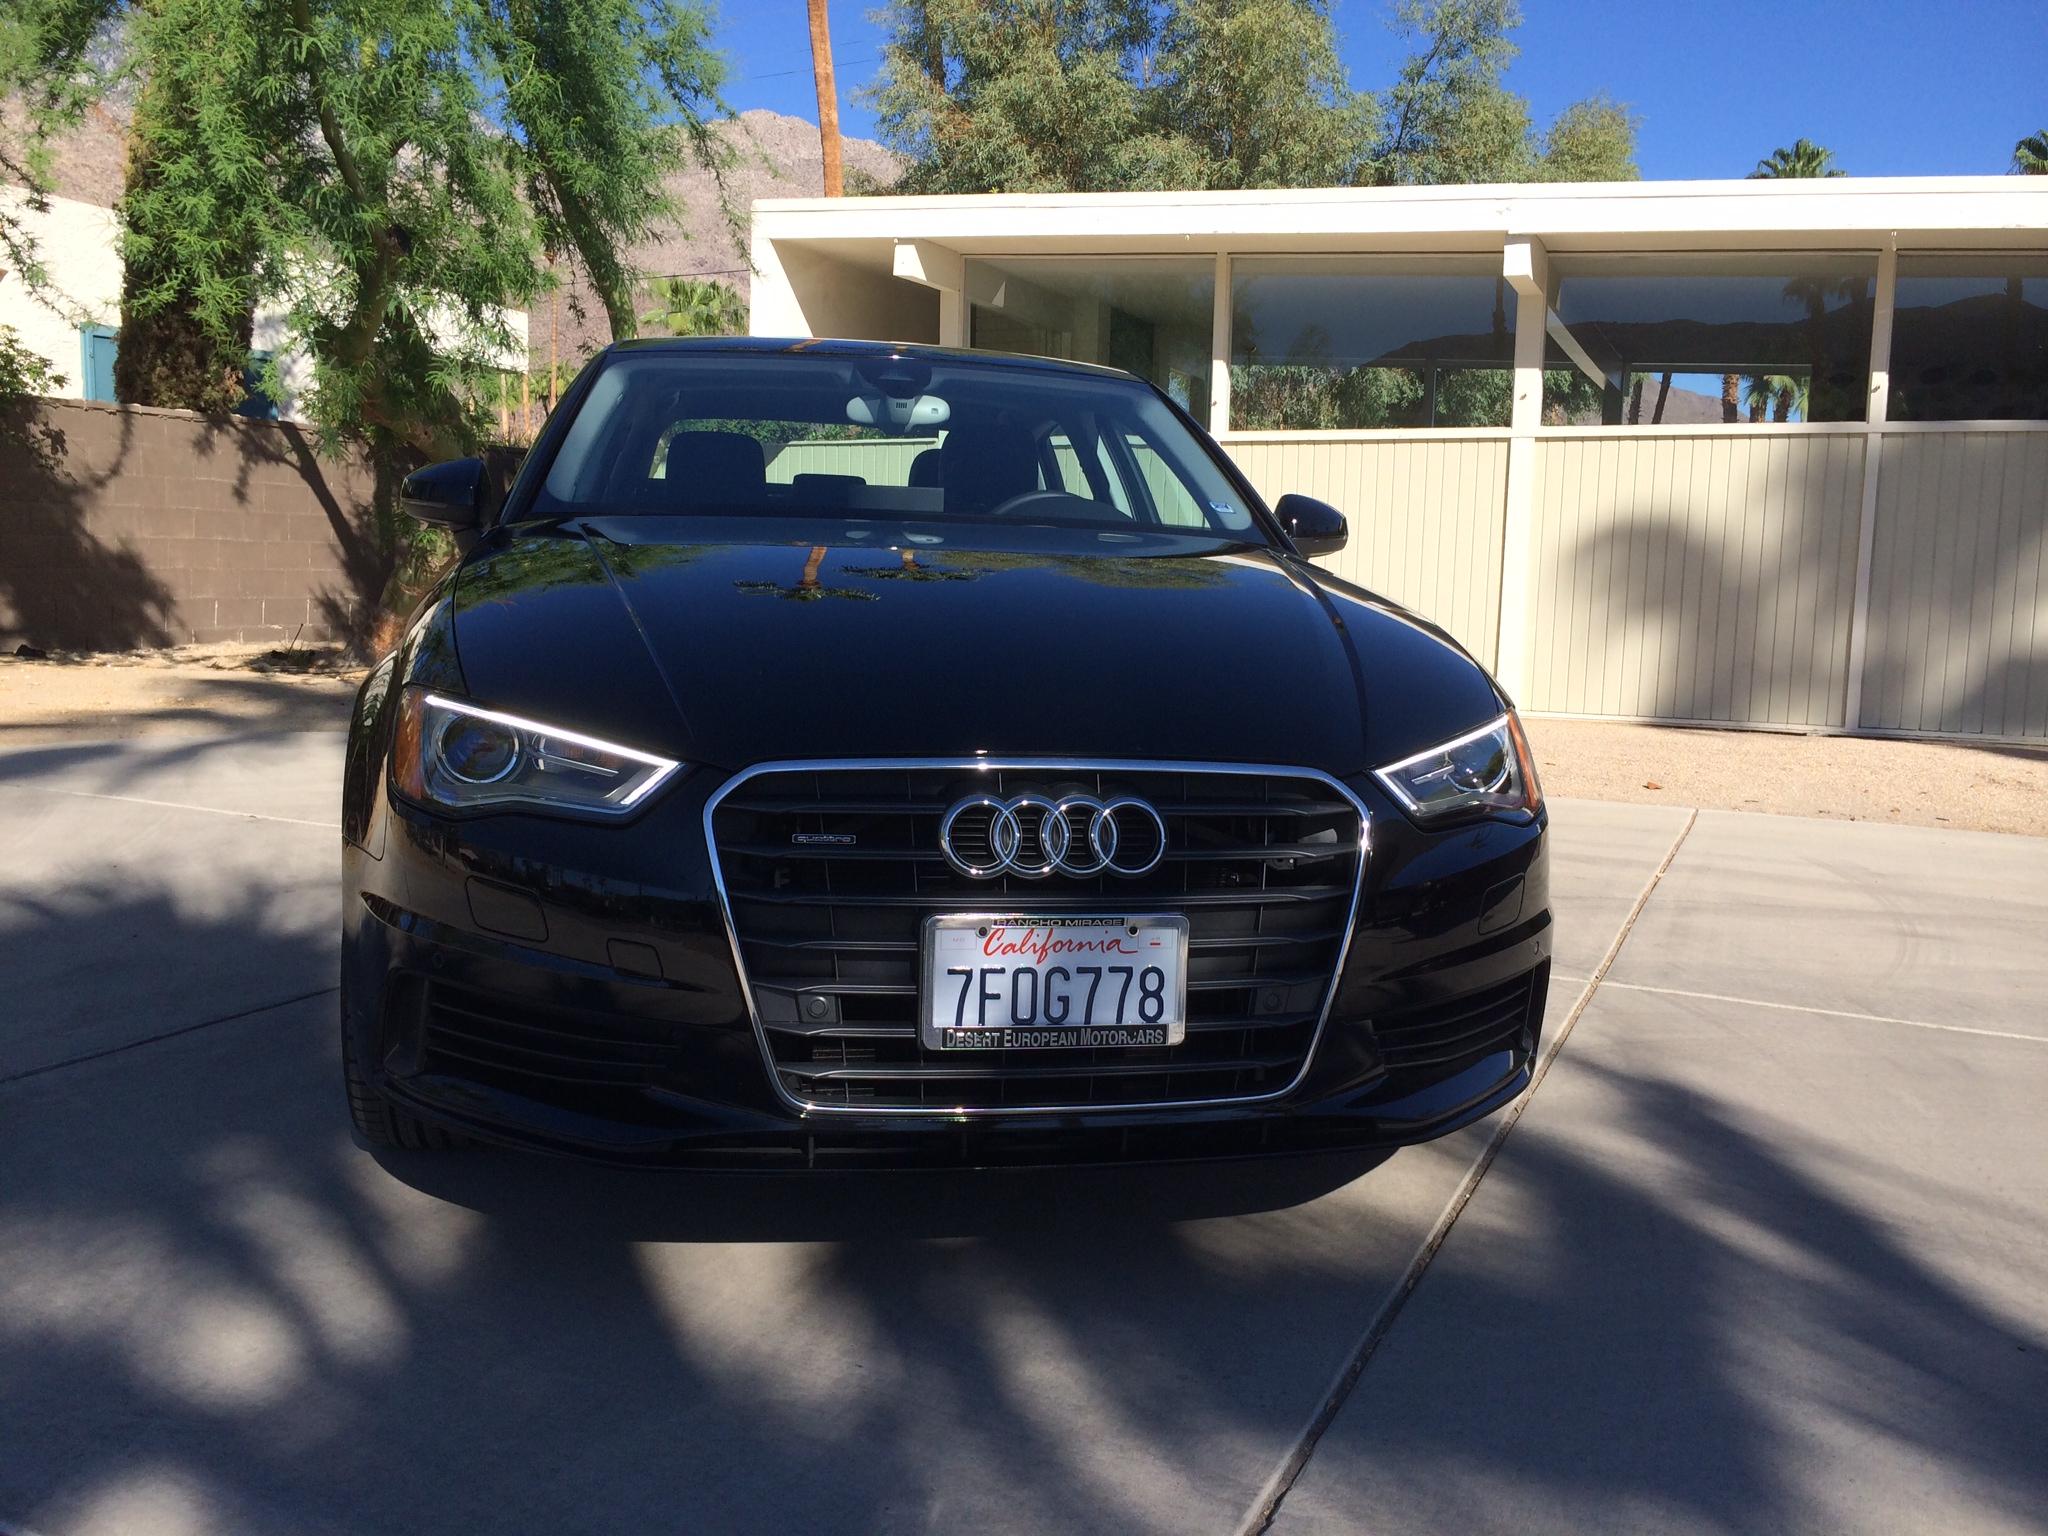 Audi Todd Bianco S Acarisnotarefrigerator Com Blog